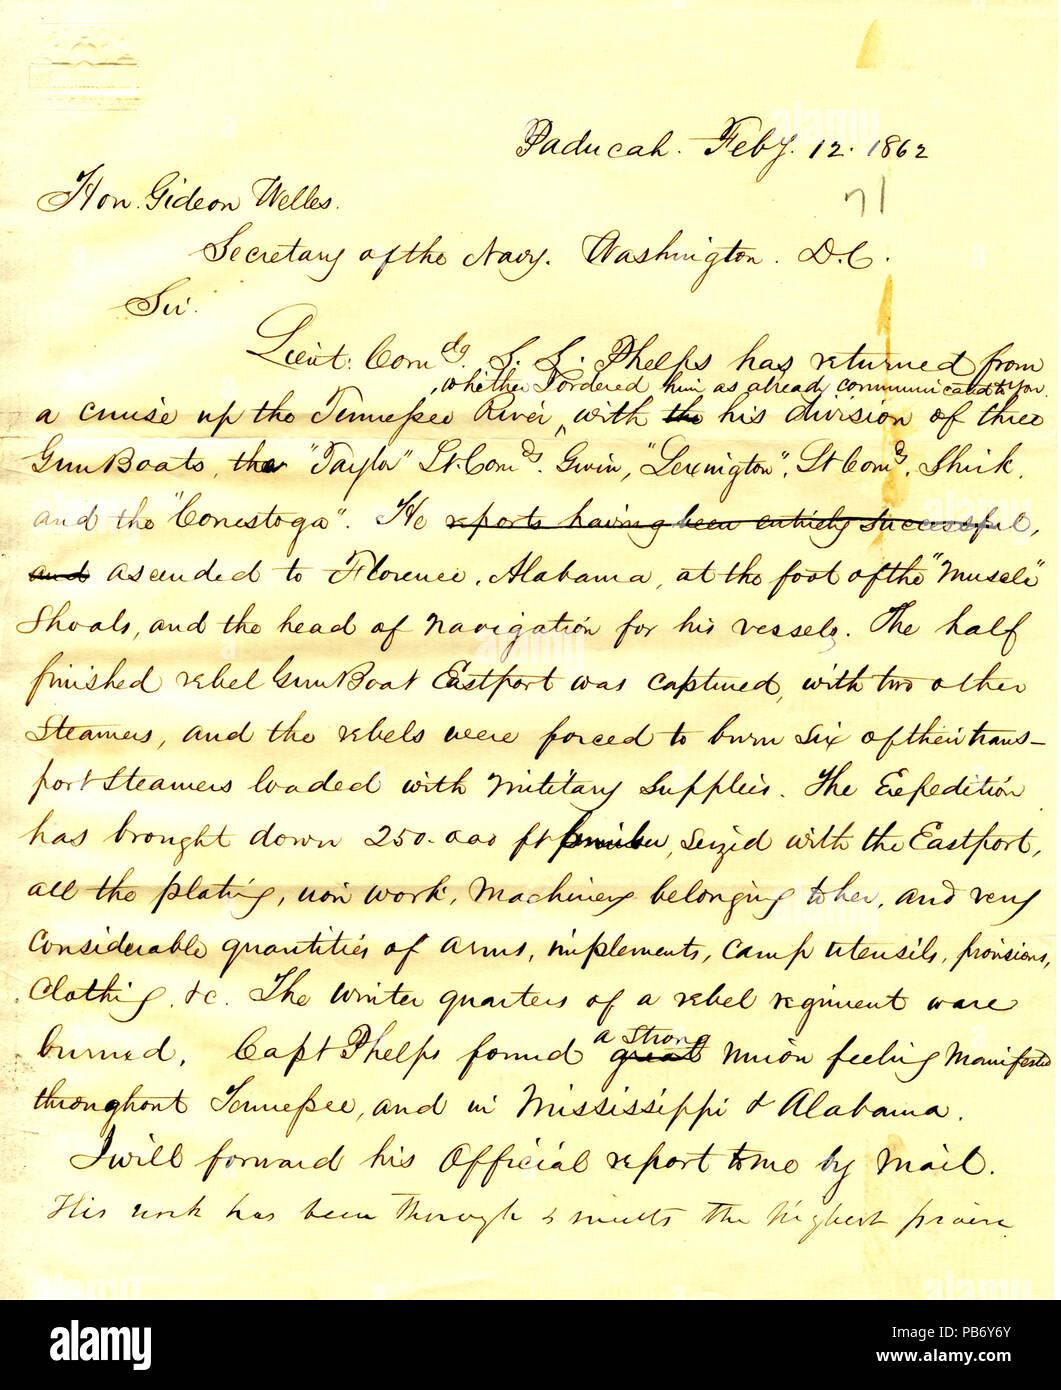 915 Letter to Gideon Welles, February 12, 1862 - Stock Image